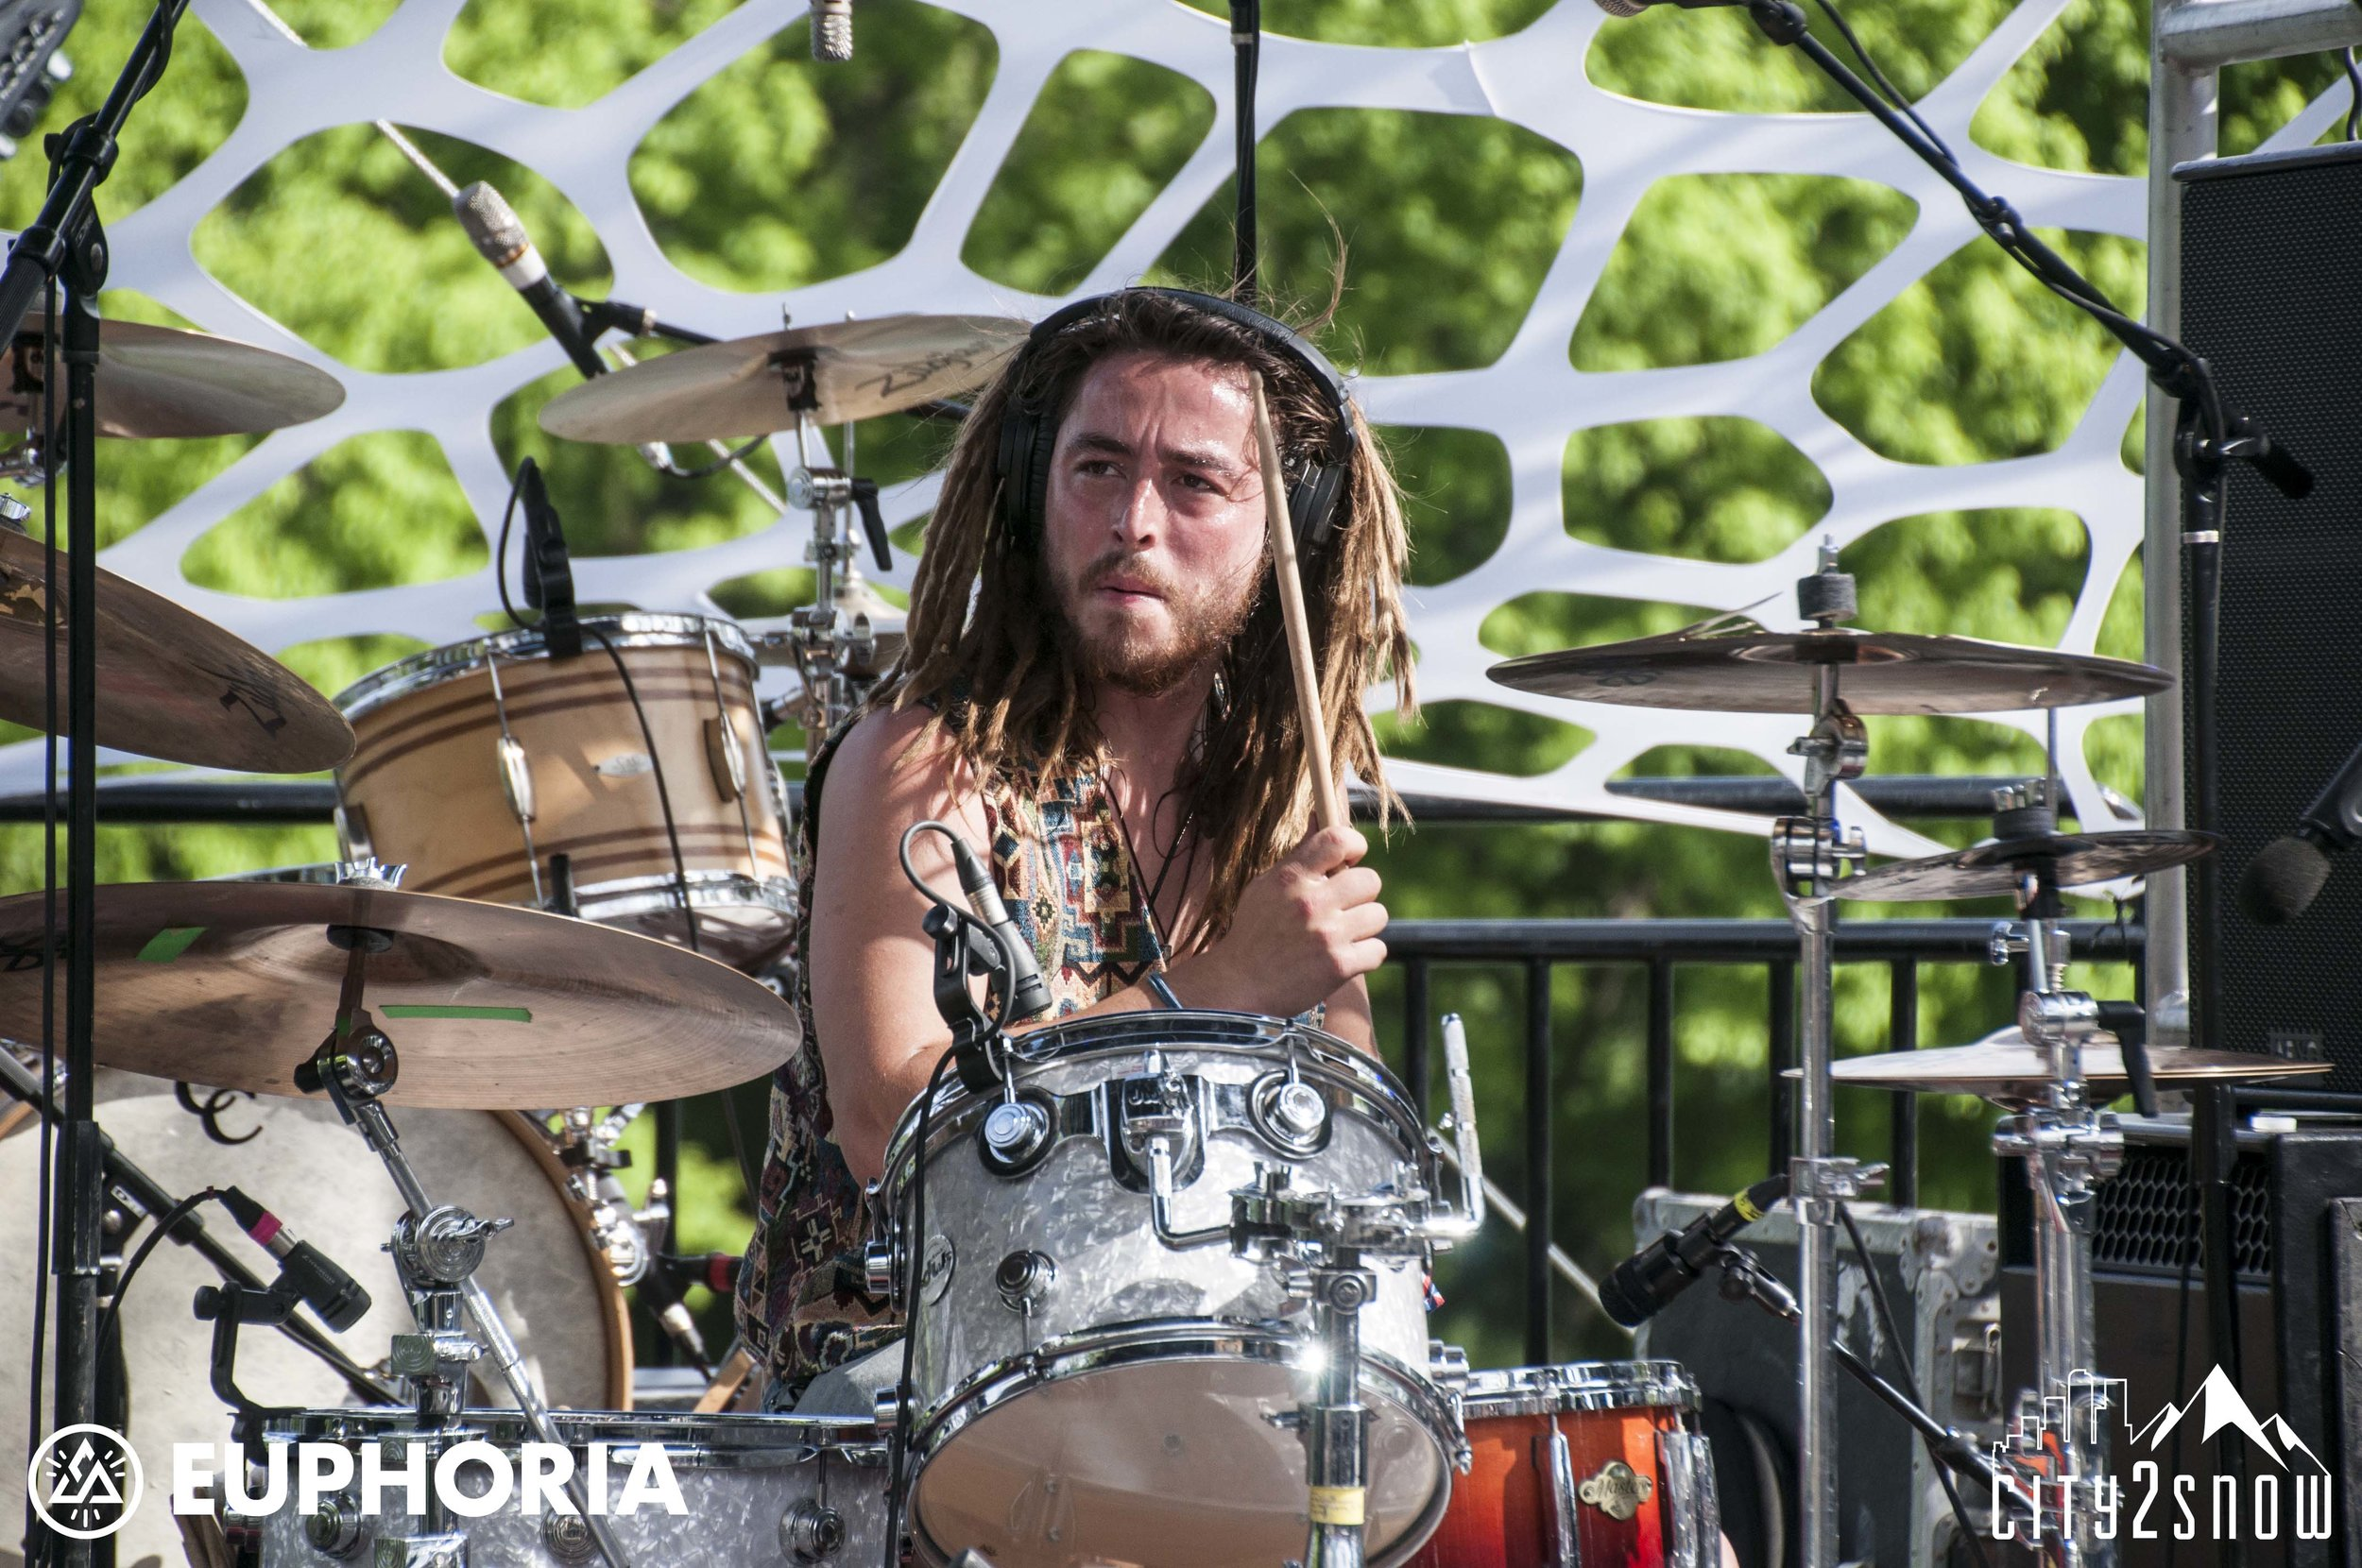 Euphoria-Music-Festival-2017-41.jpg